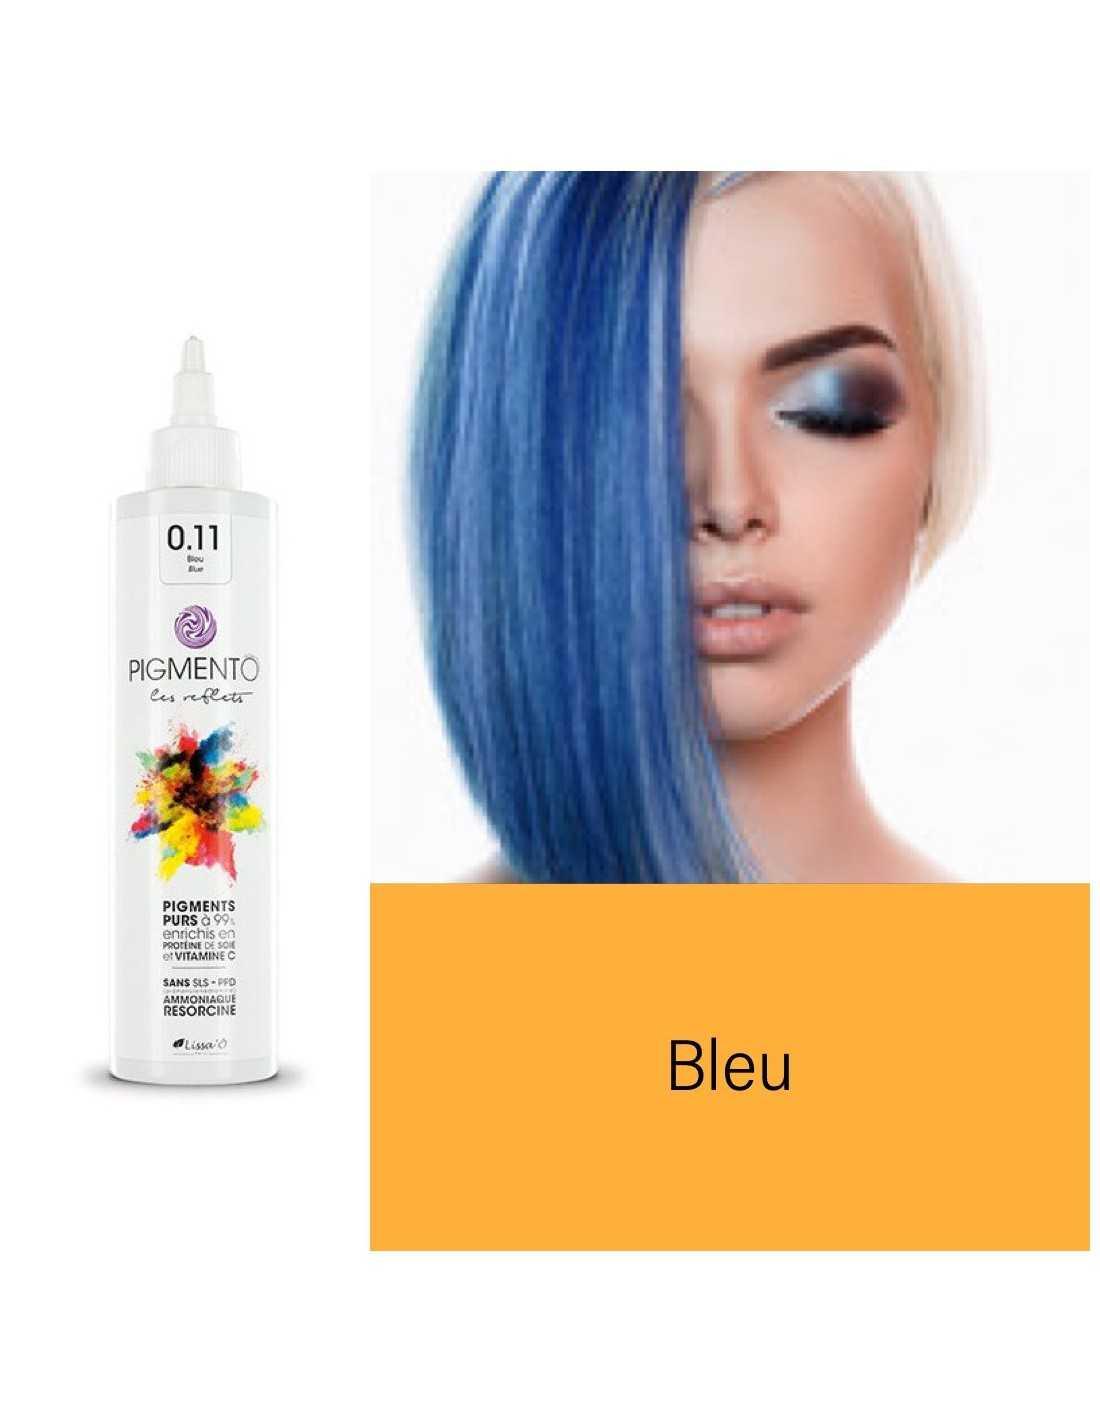 Coloration Pigmento reflet bleu n° 0.11